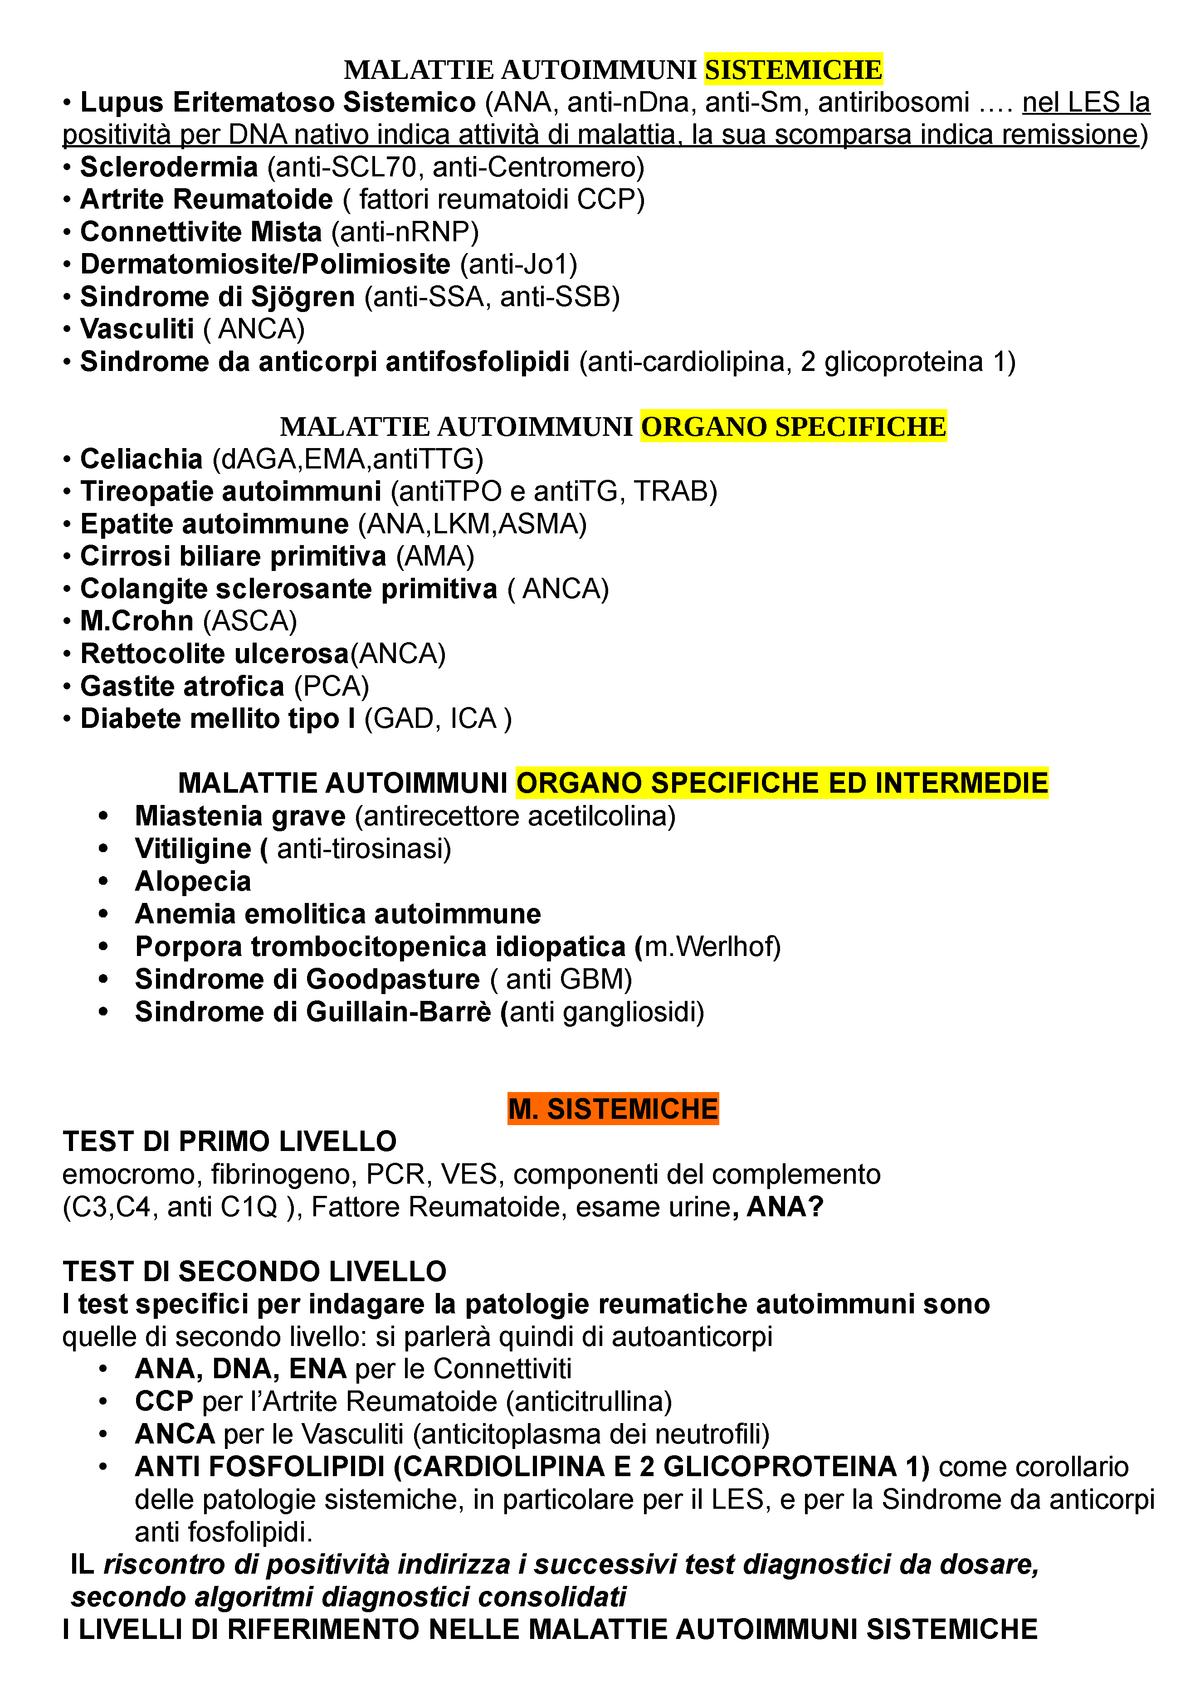 Sinossi Malattie Autoimmuni Sistemiche - Medicina Interna